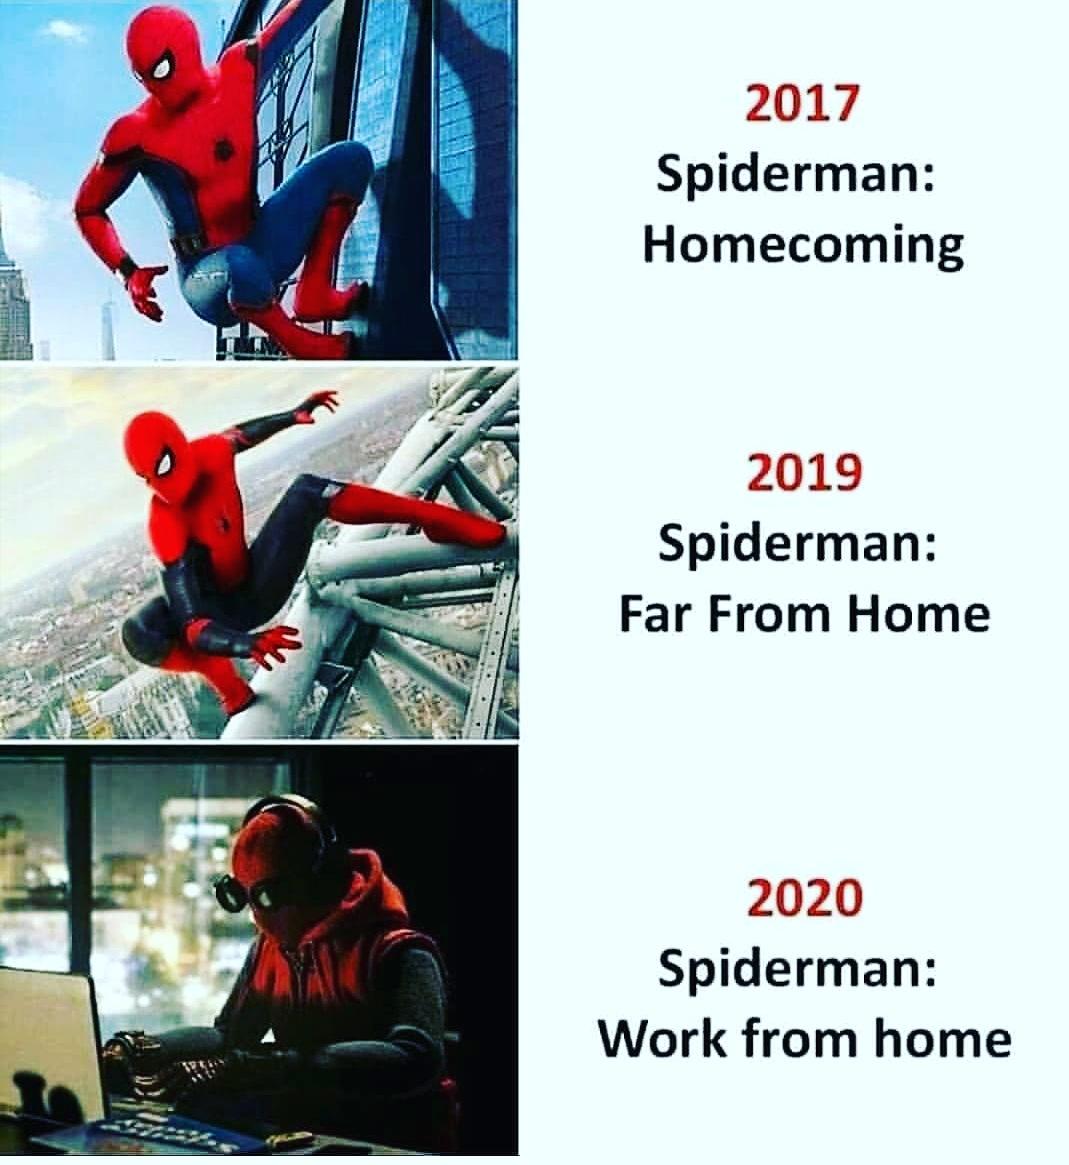 #meme #memes #bestmemes #instamemes #funny #funnymemes #dankmemes #offensivememes #edymemes #spicymemes #nichememes #memepage #funniestmemes #dank #memesdaily #jokes #memesrlife #memestar #memesquad #humor #lmao #igmemes #lol #memesaccount #memer #relatablememes #funnypostspic.twitter.com/3iuBH2JWba